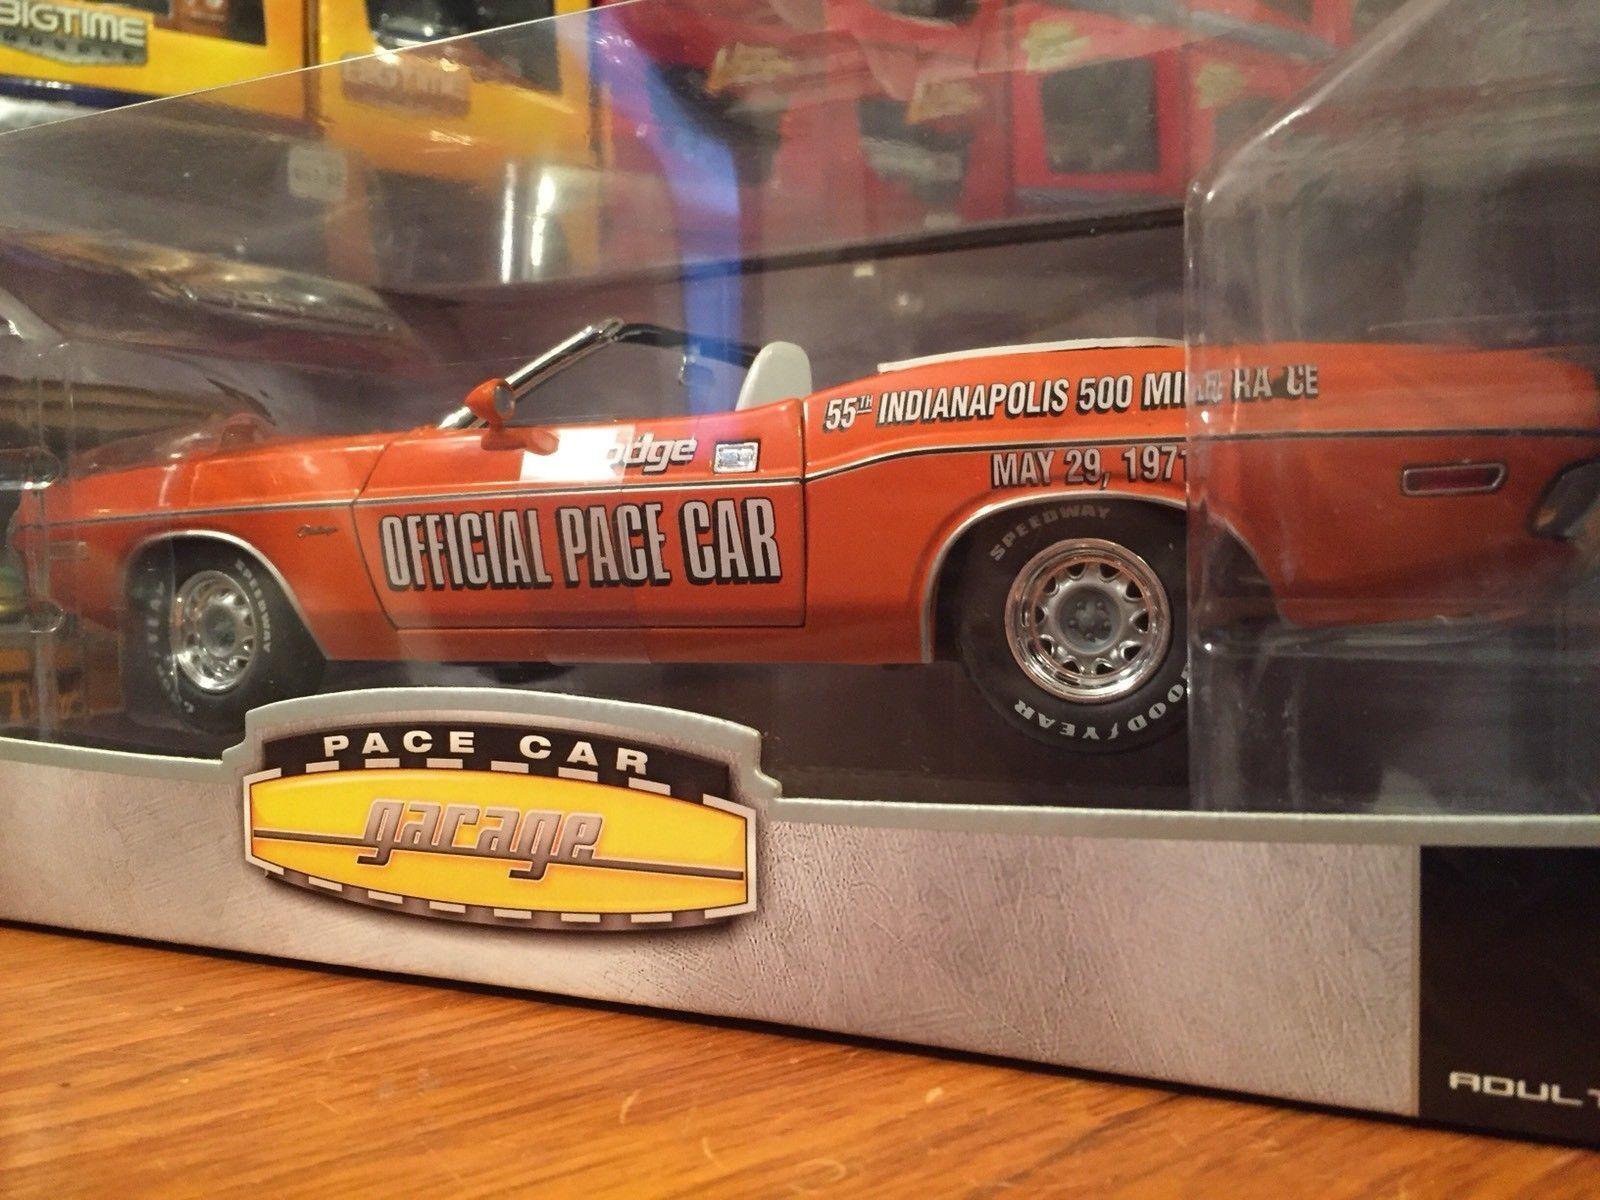 1:18 verdelight 1970 Dodge Challenger Convertibile Ritmo Car 55th.Indianapolis